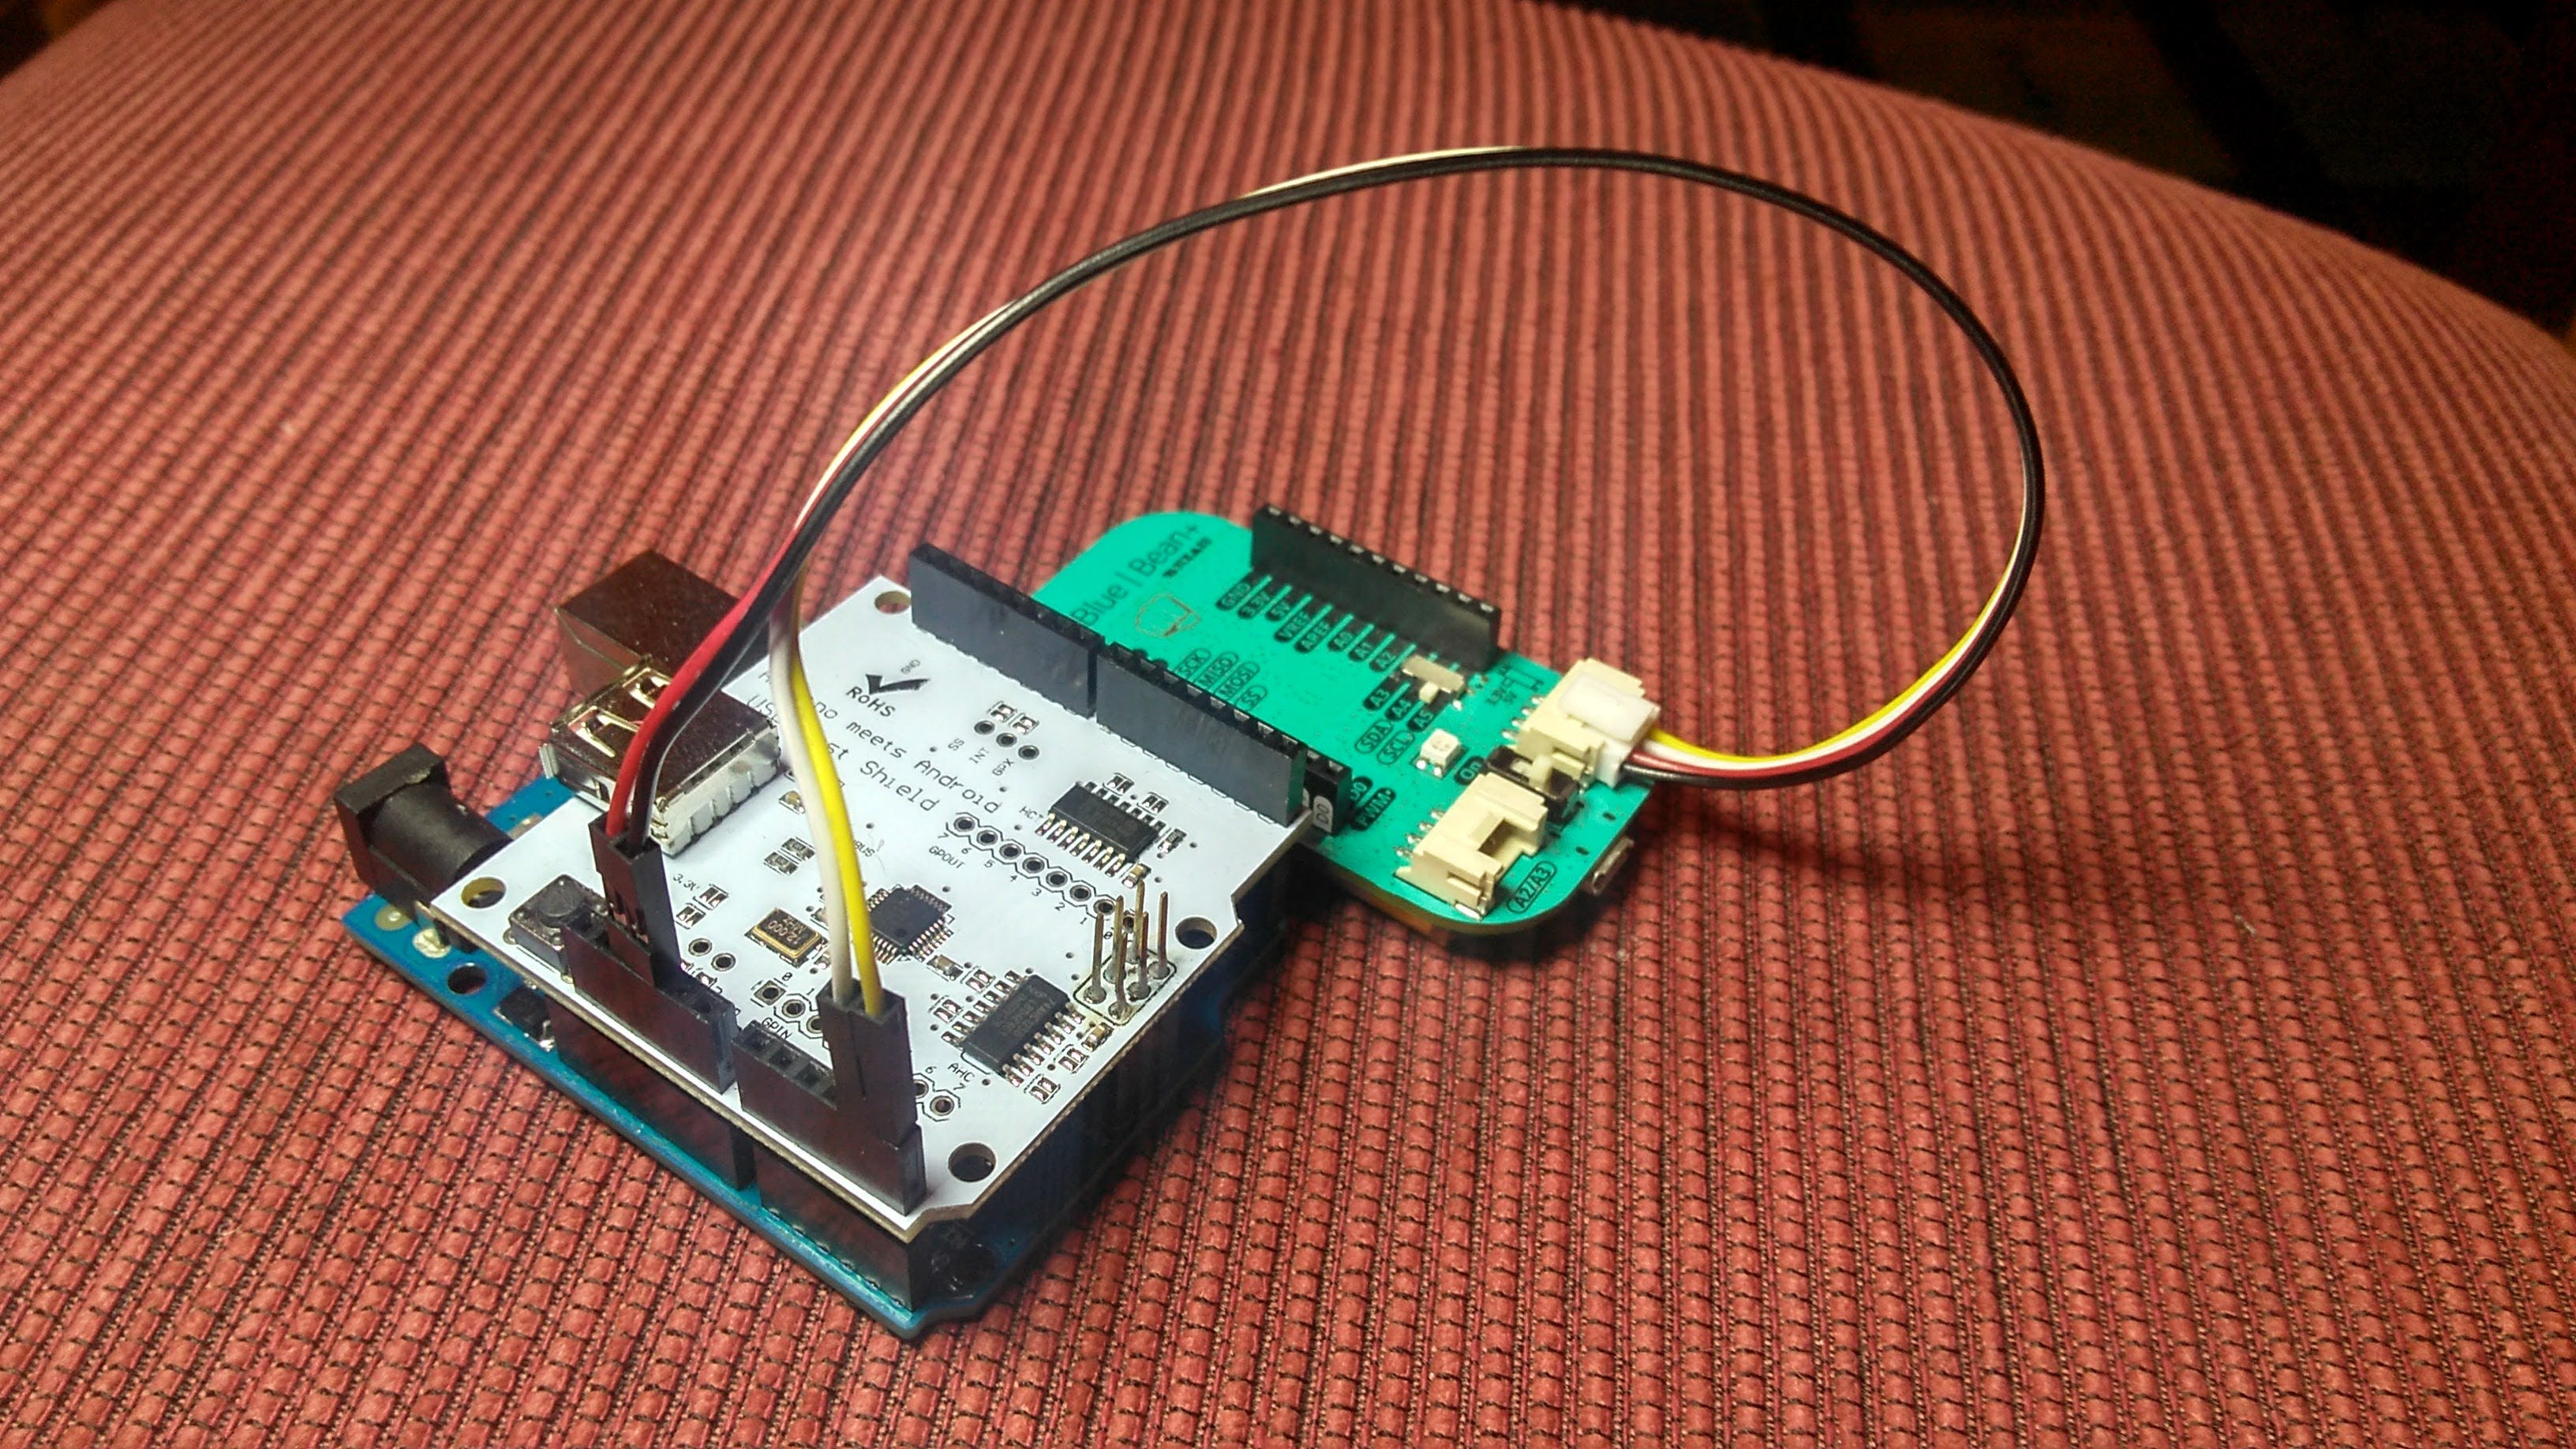 Arduino Uno + USB Host Shield + LightBlue Bean+